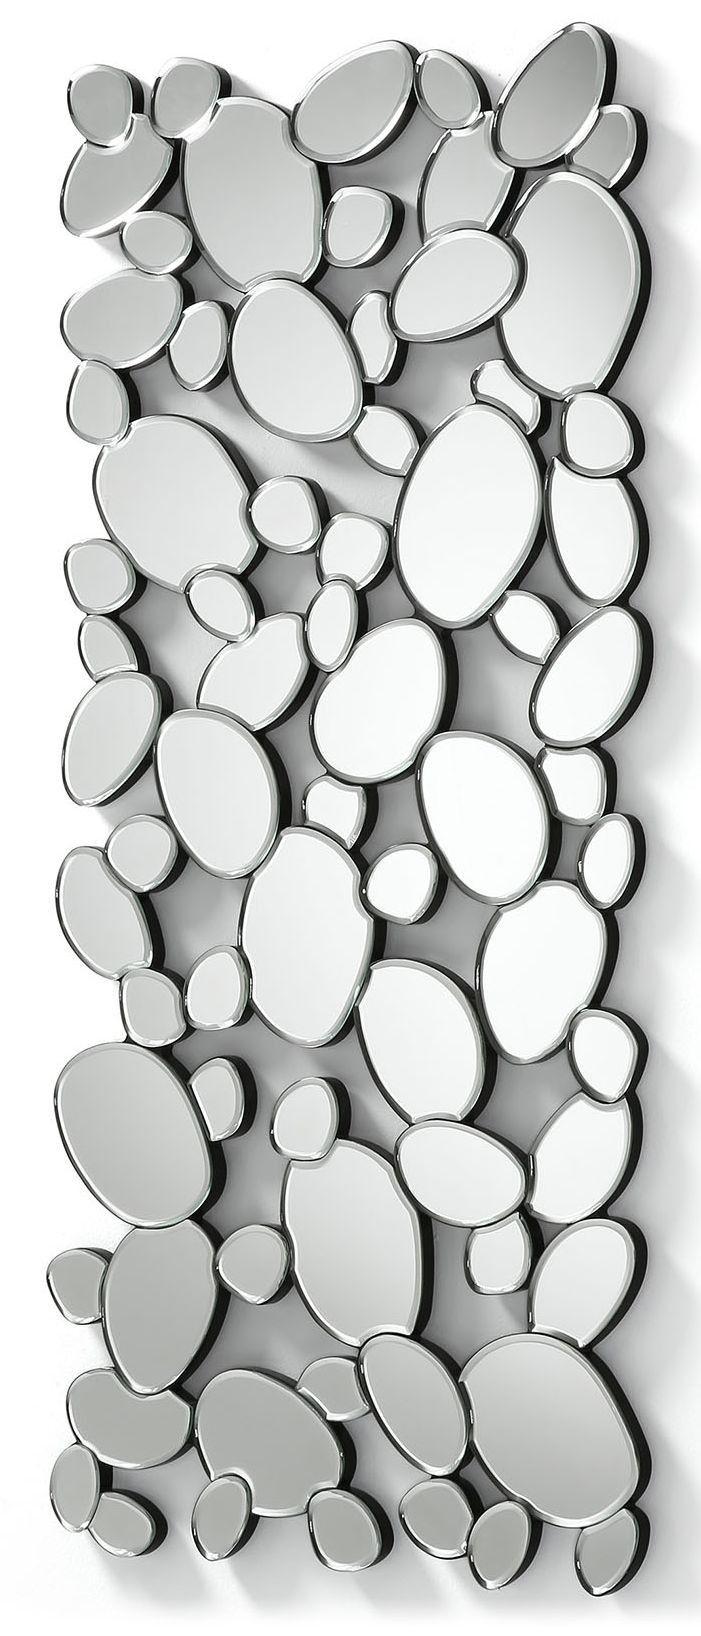 17 beste idee n over woonkamer spiegels op pinterest kelder appartement decor gezellige - Grote woonkamer design spiegel ...